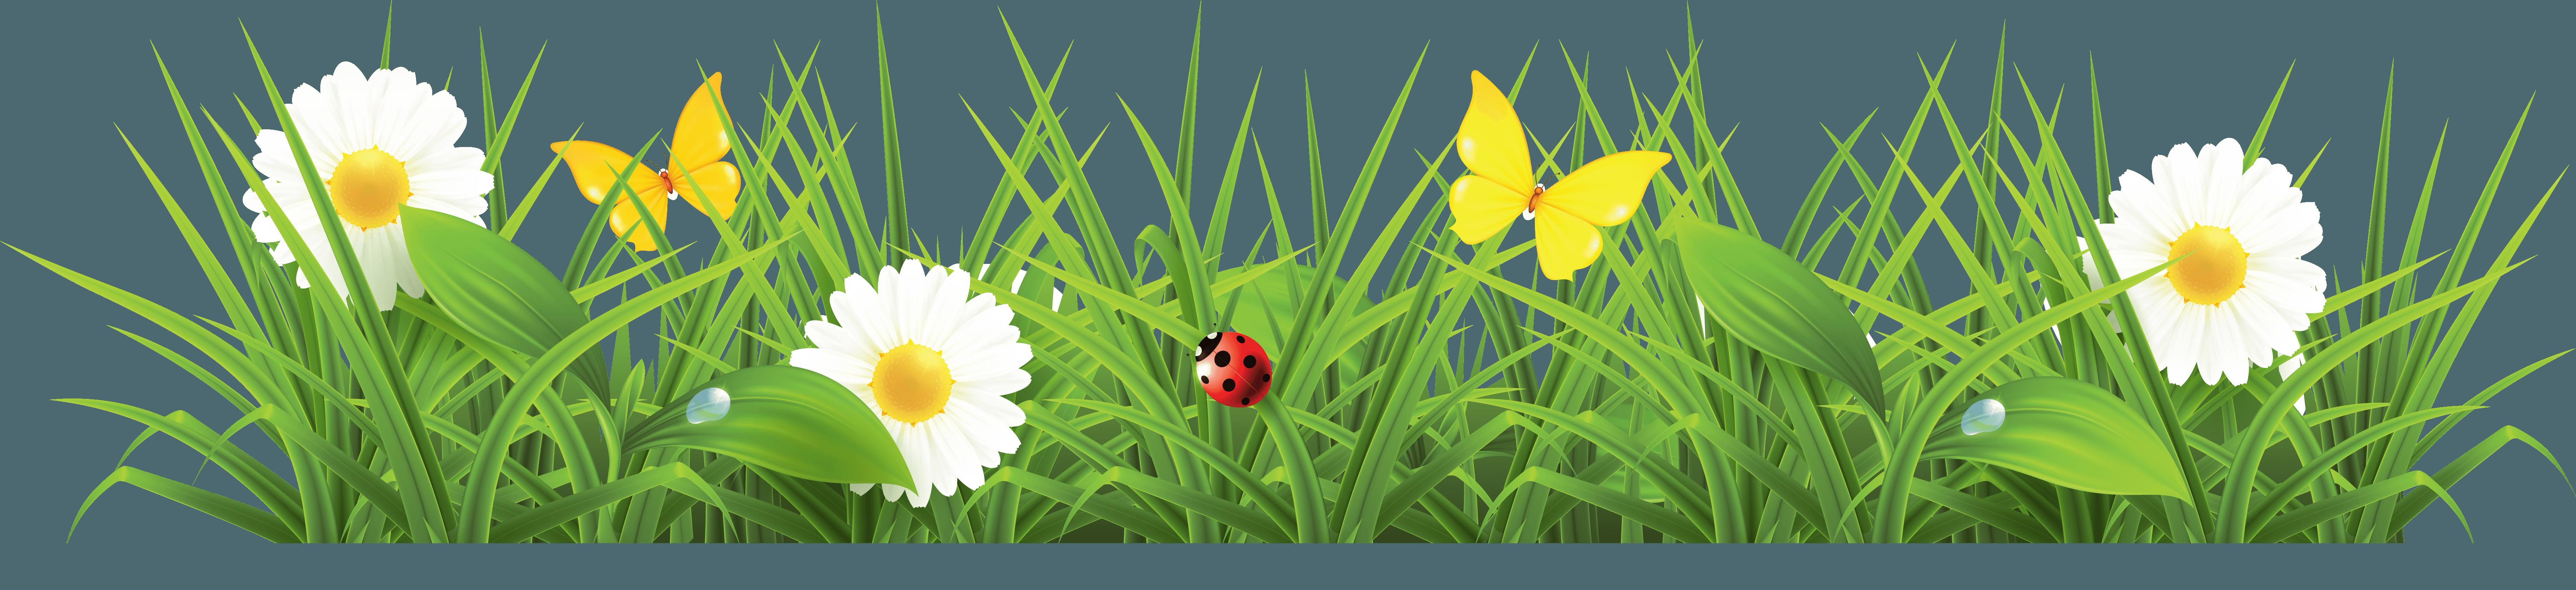 Download PNG image - Grass Pn